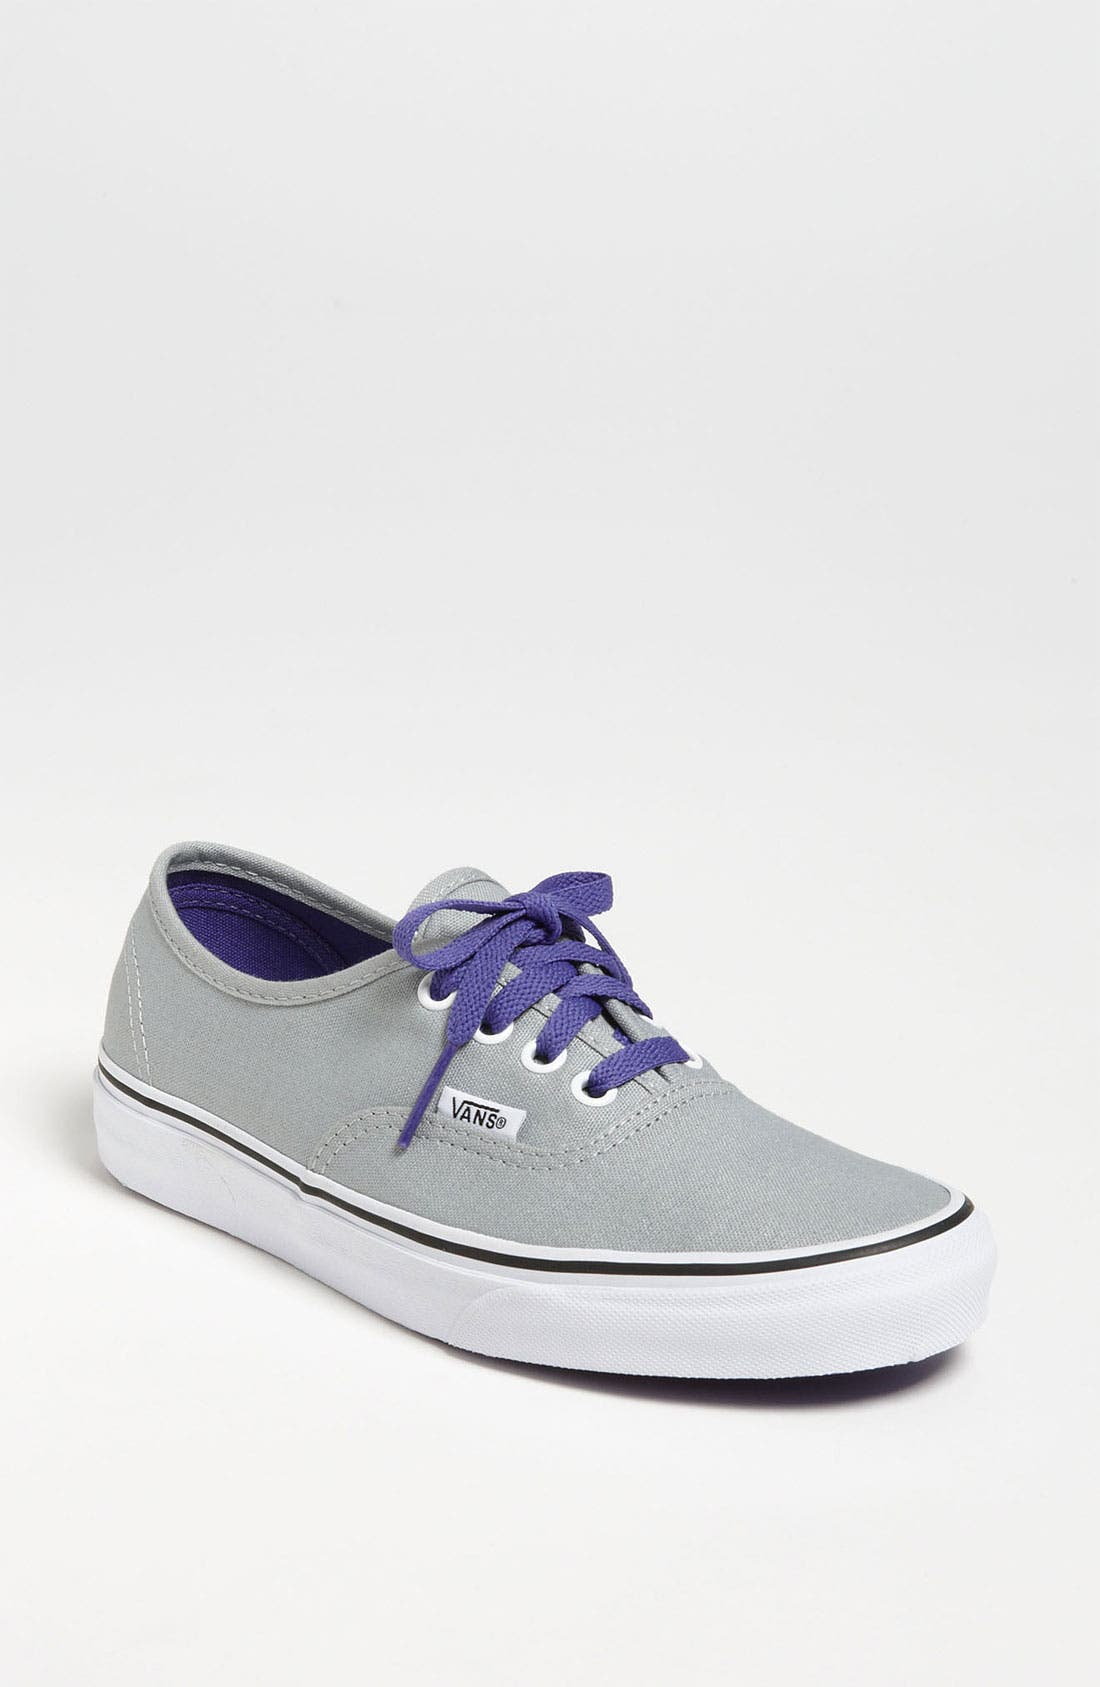 Alternate Image 1 Selected - Vans 'Authentic - Pop' Sneaker (Women)